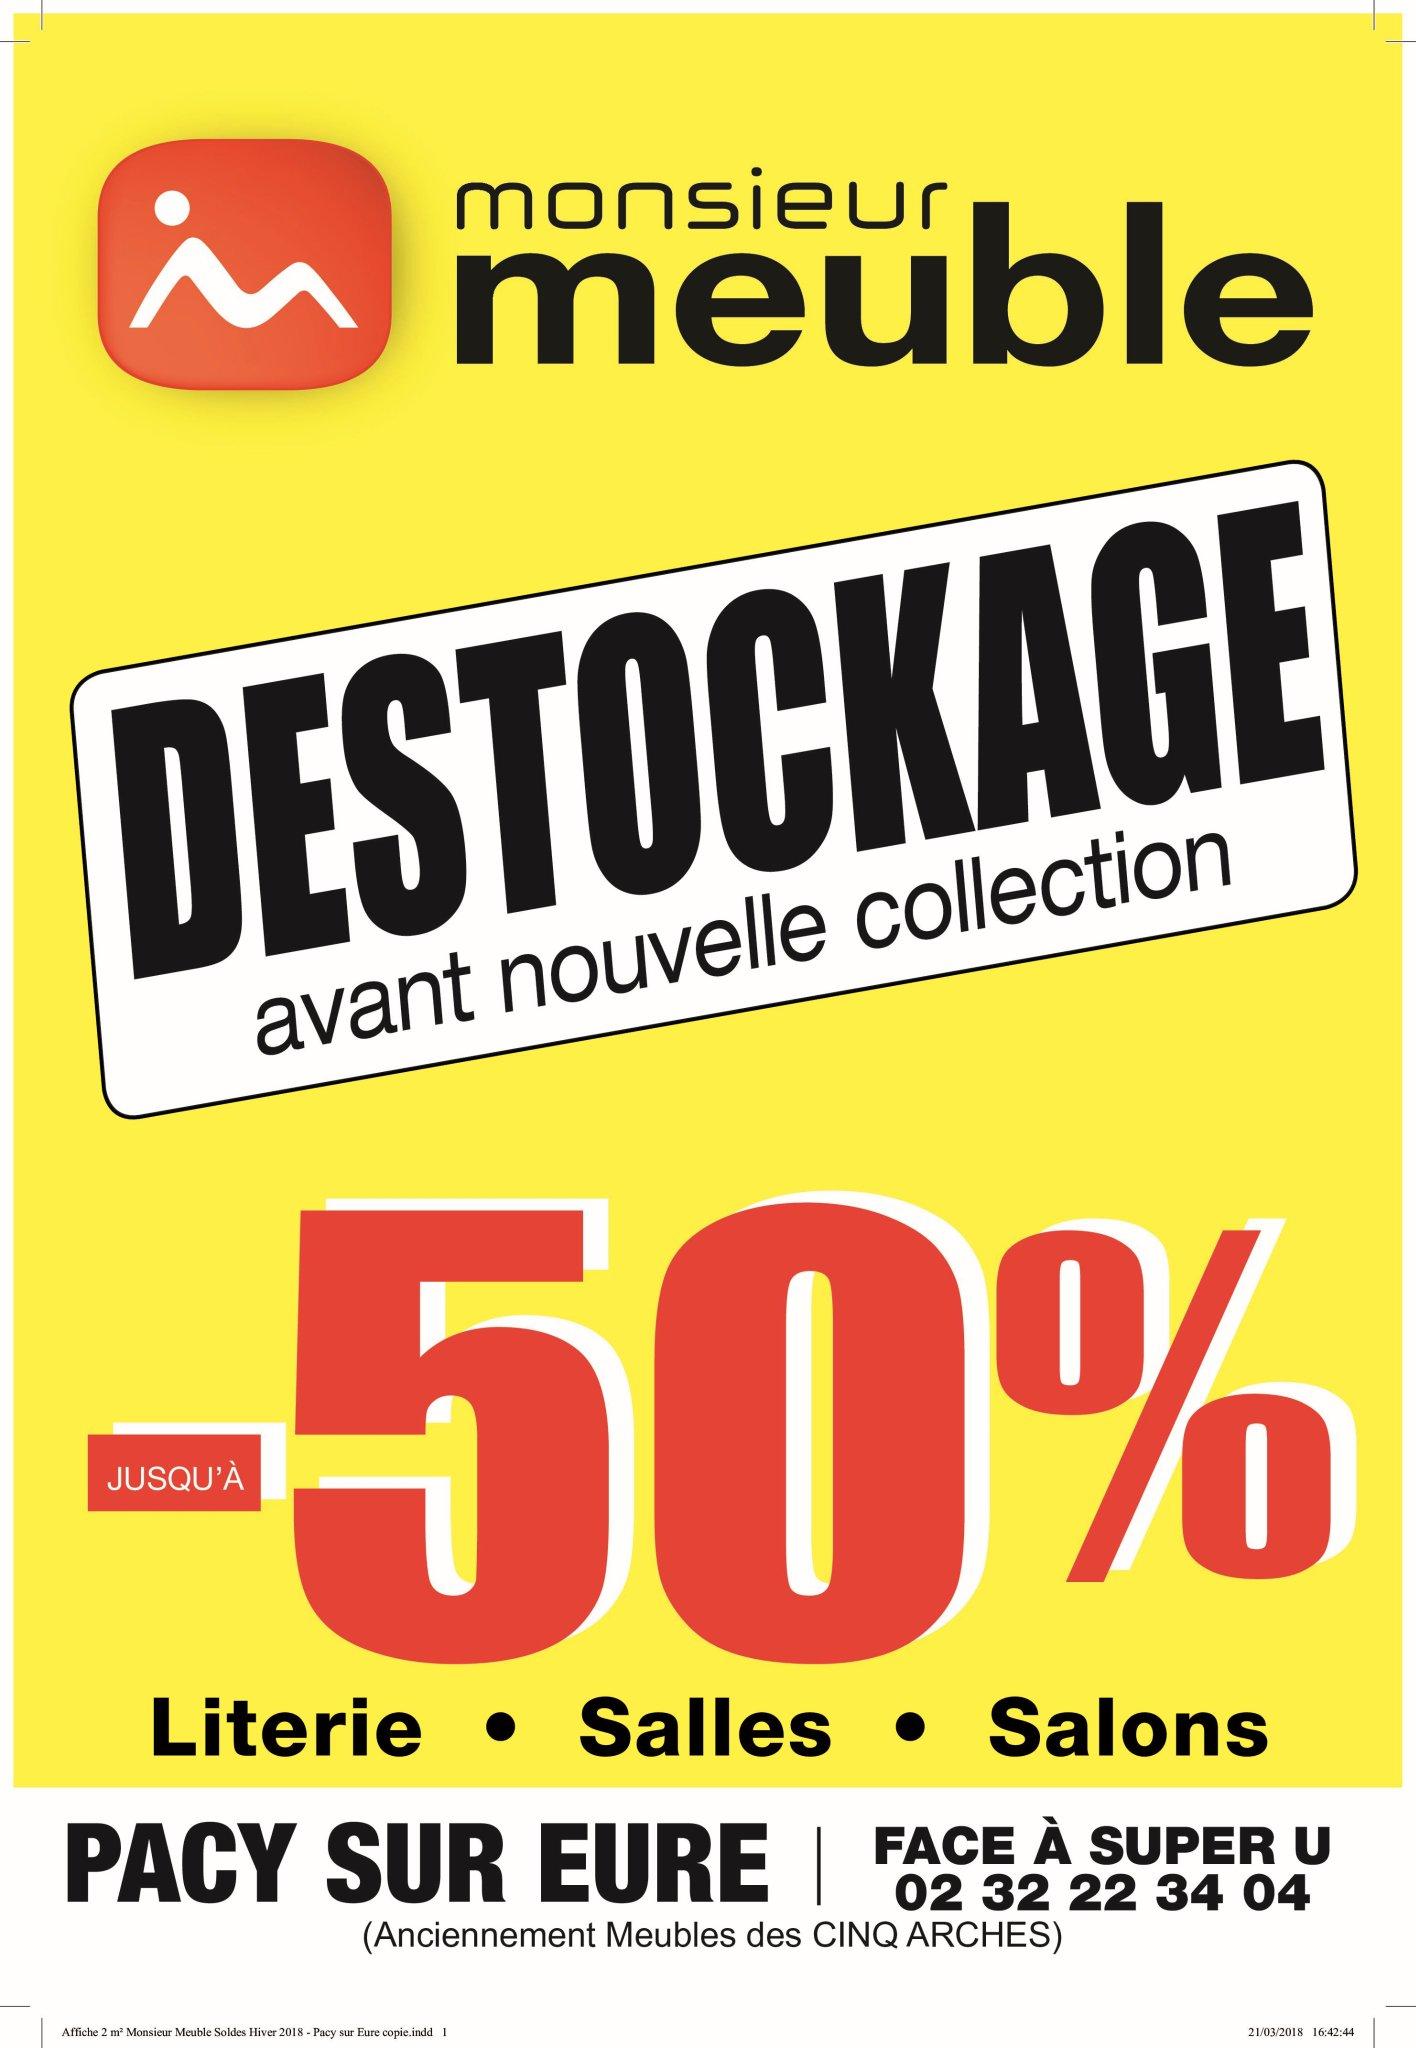 Monsieur Meuble Pacy On Twitter Grand Destockage Chez